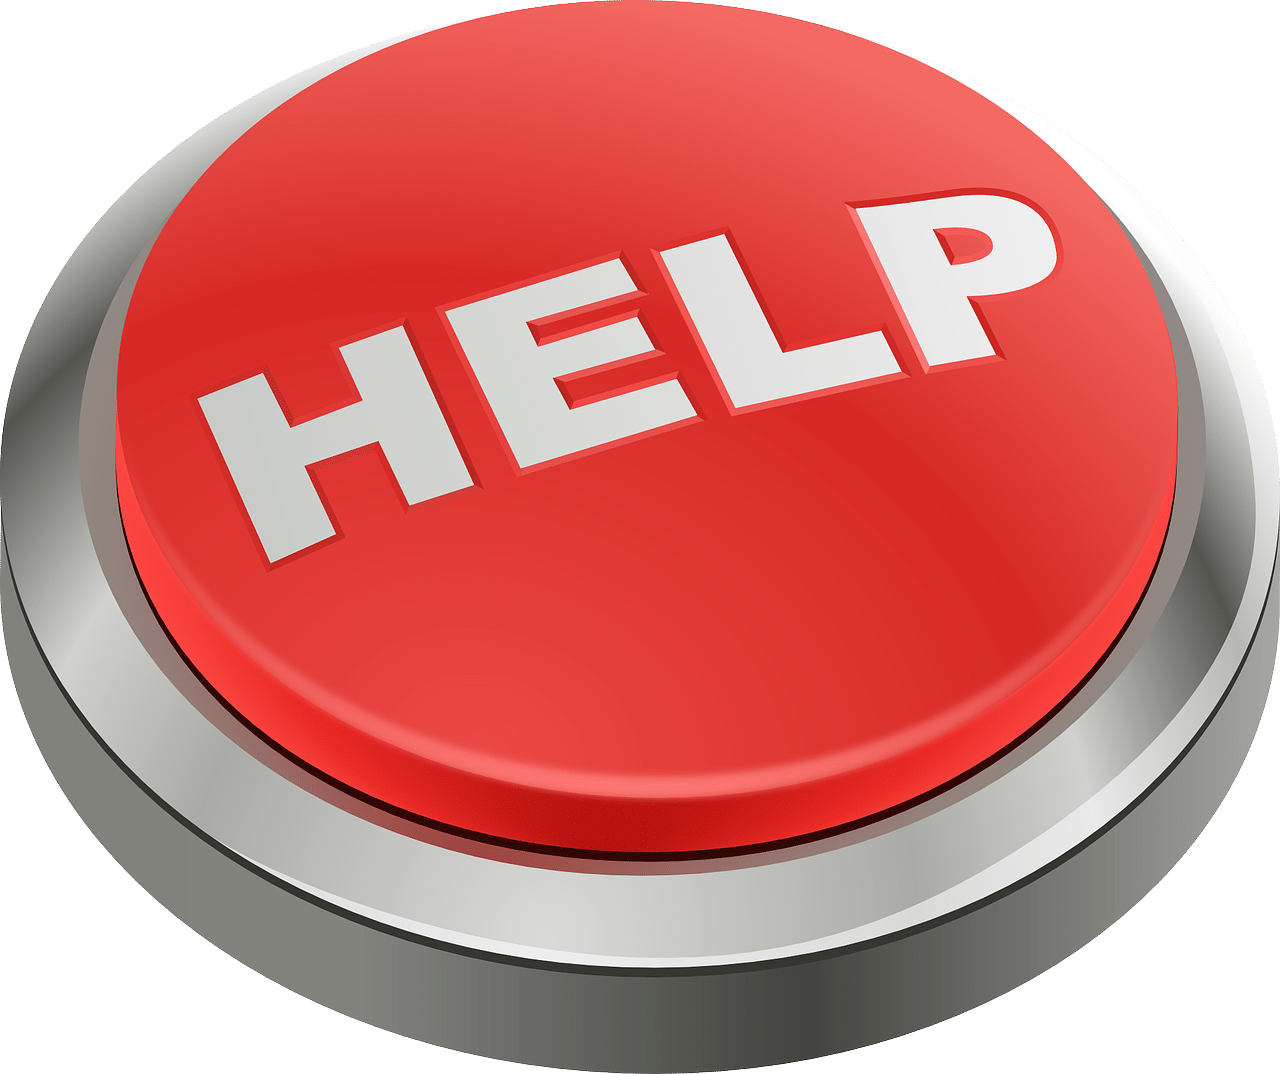 help_153094_1280